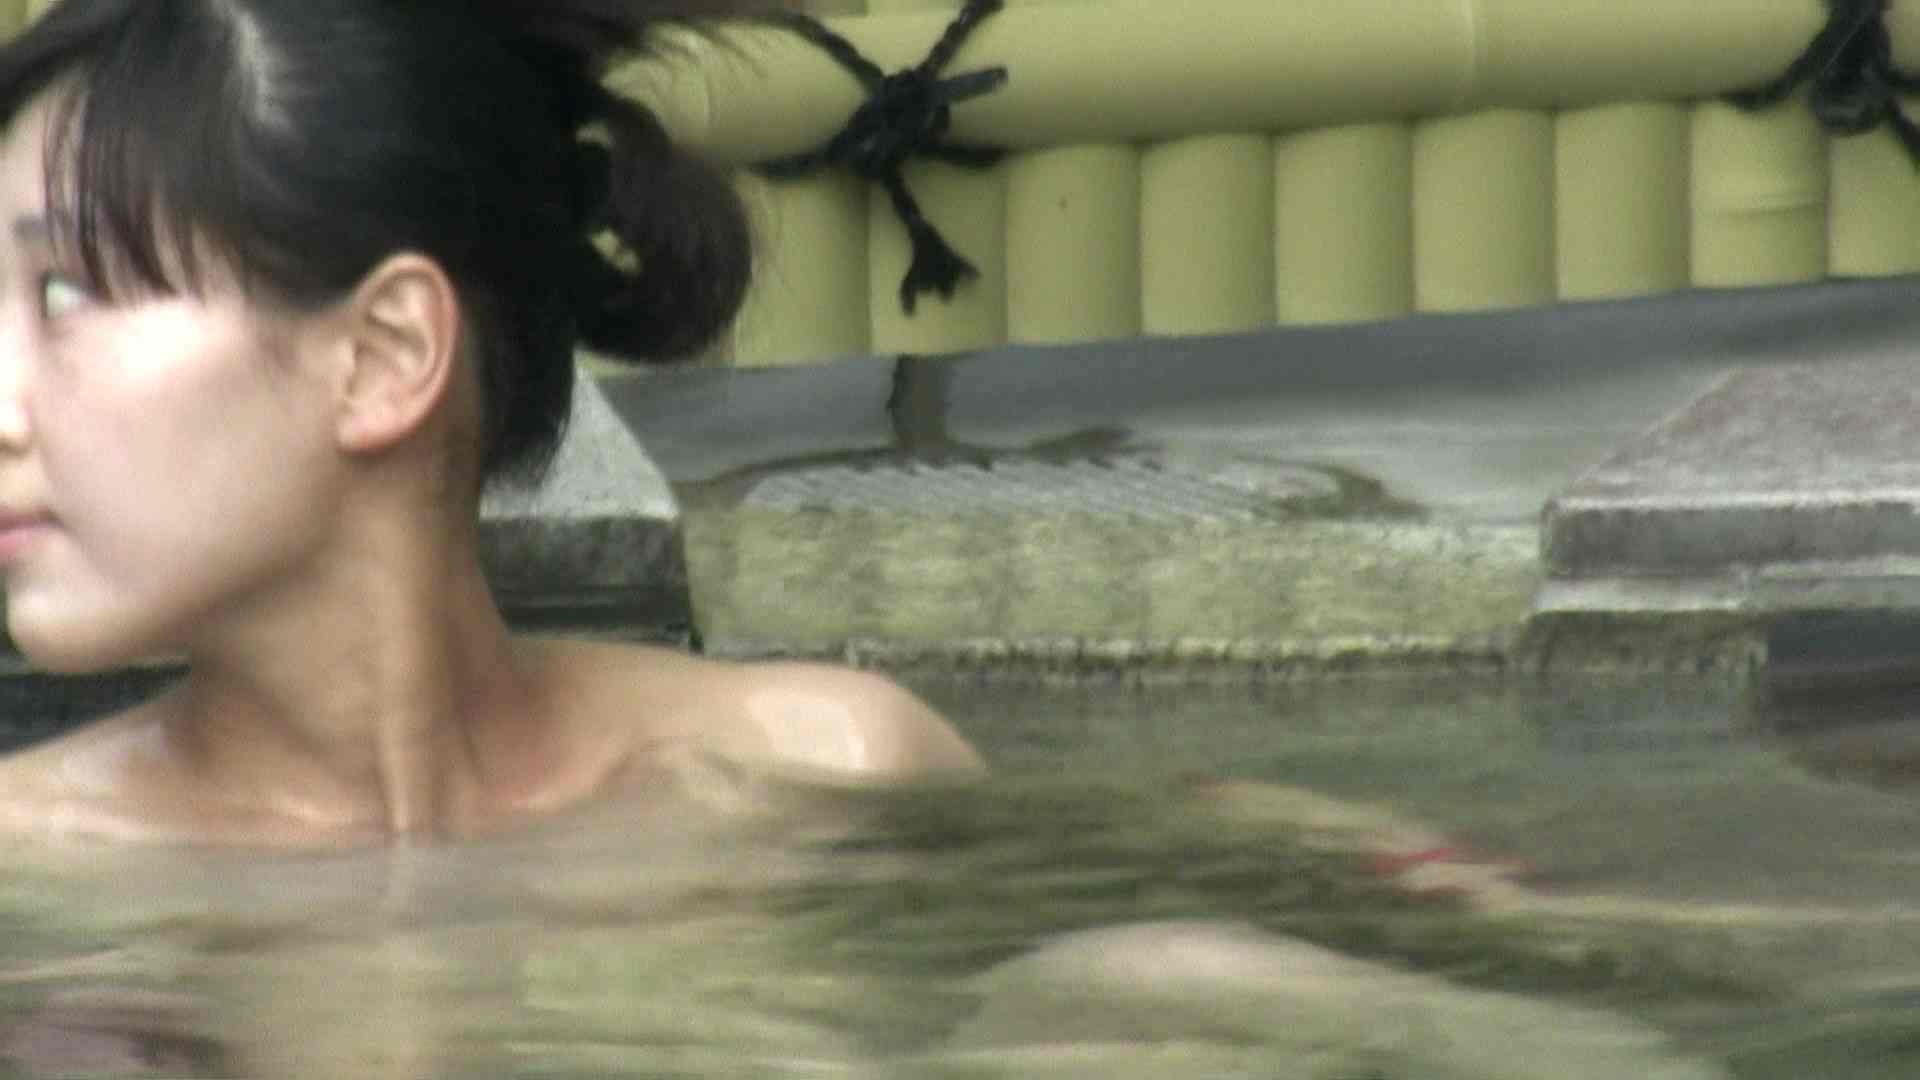 Aquaな露天風呂Vol.665 綺麗なOLたち  85枚 45